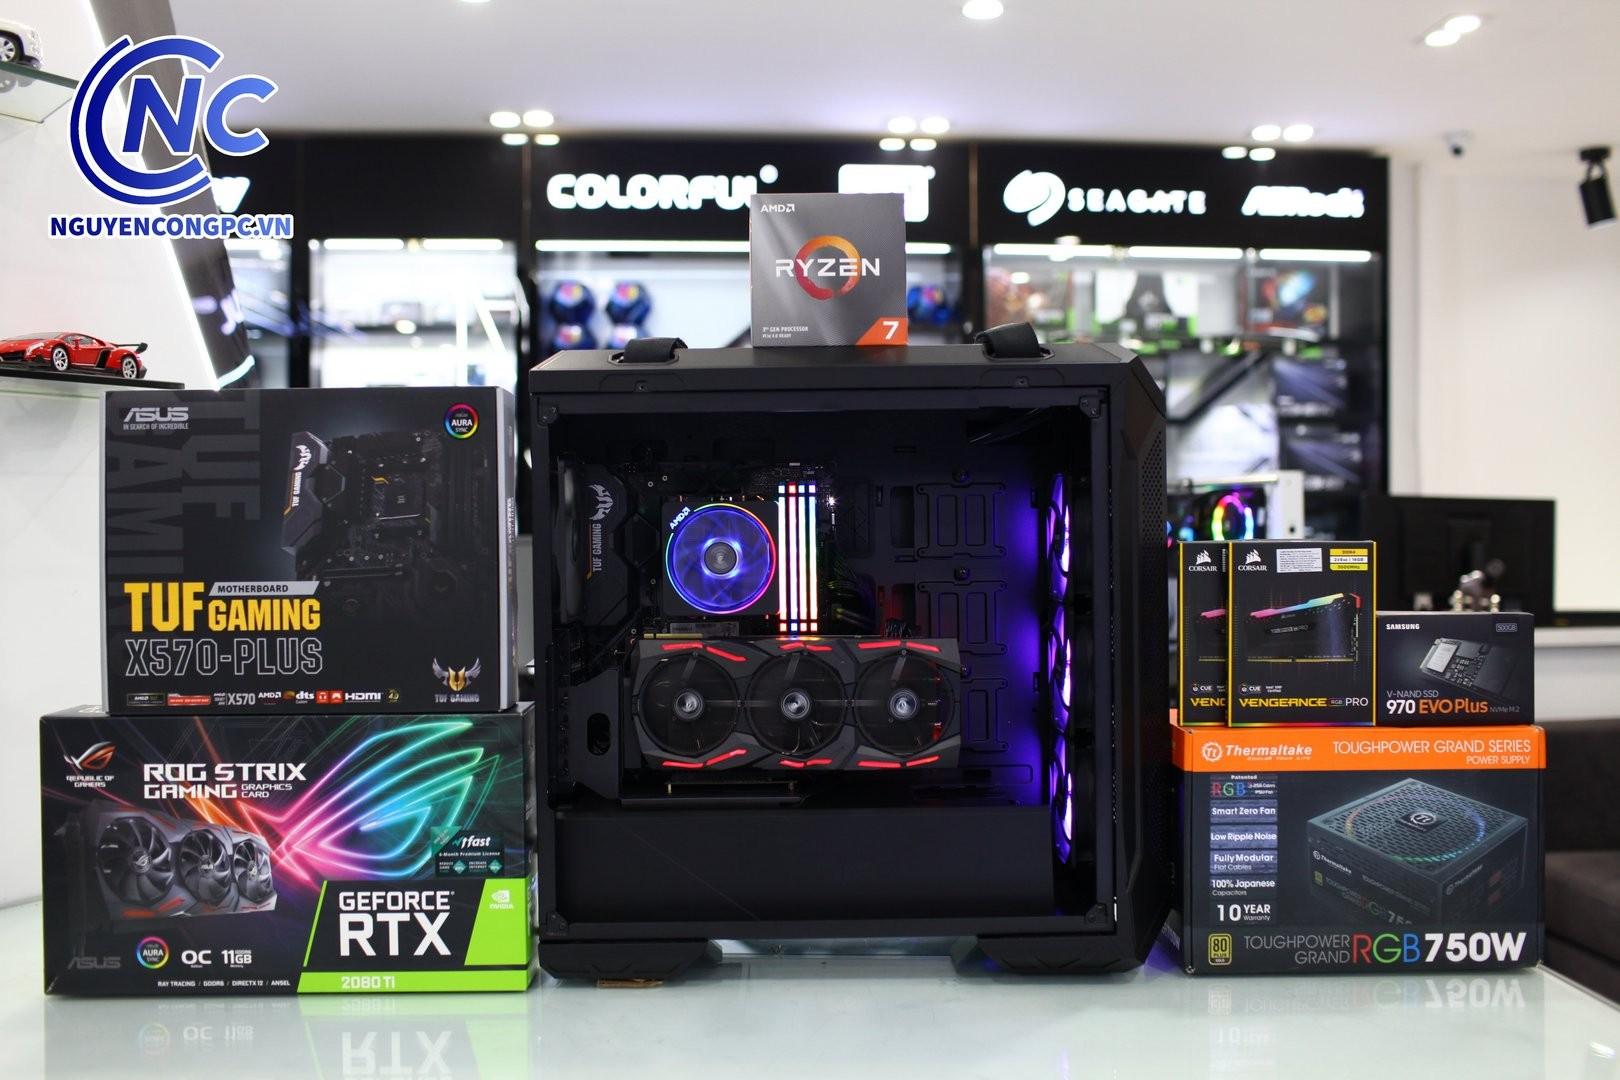 BỘ PC AMD RYZEN 7 3700X / RAM 32GB / RTX 2080 TI 11G